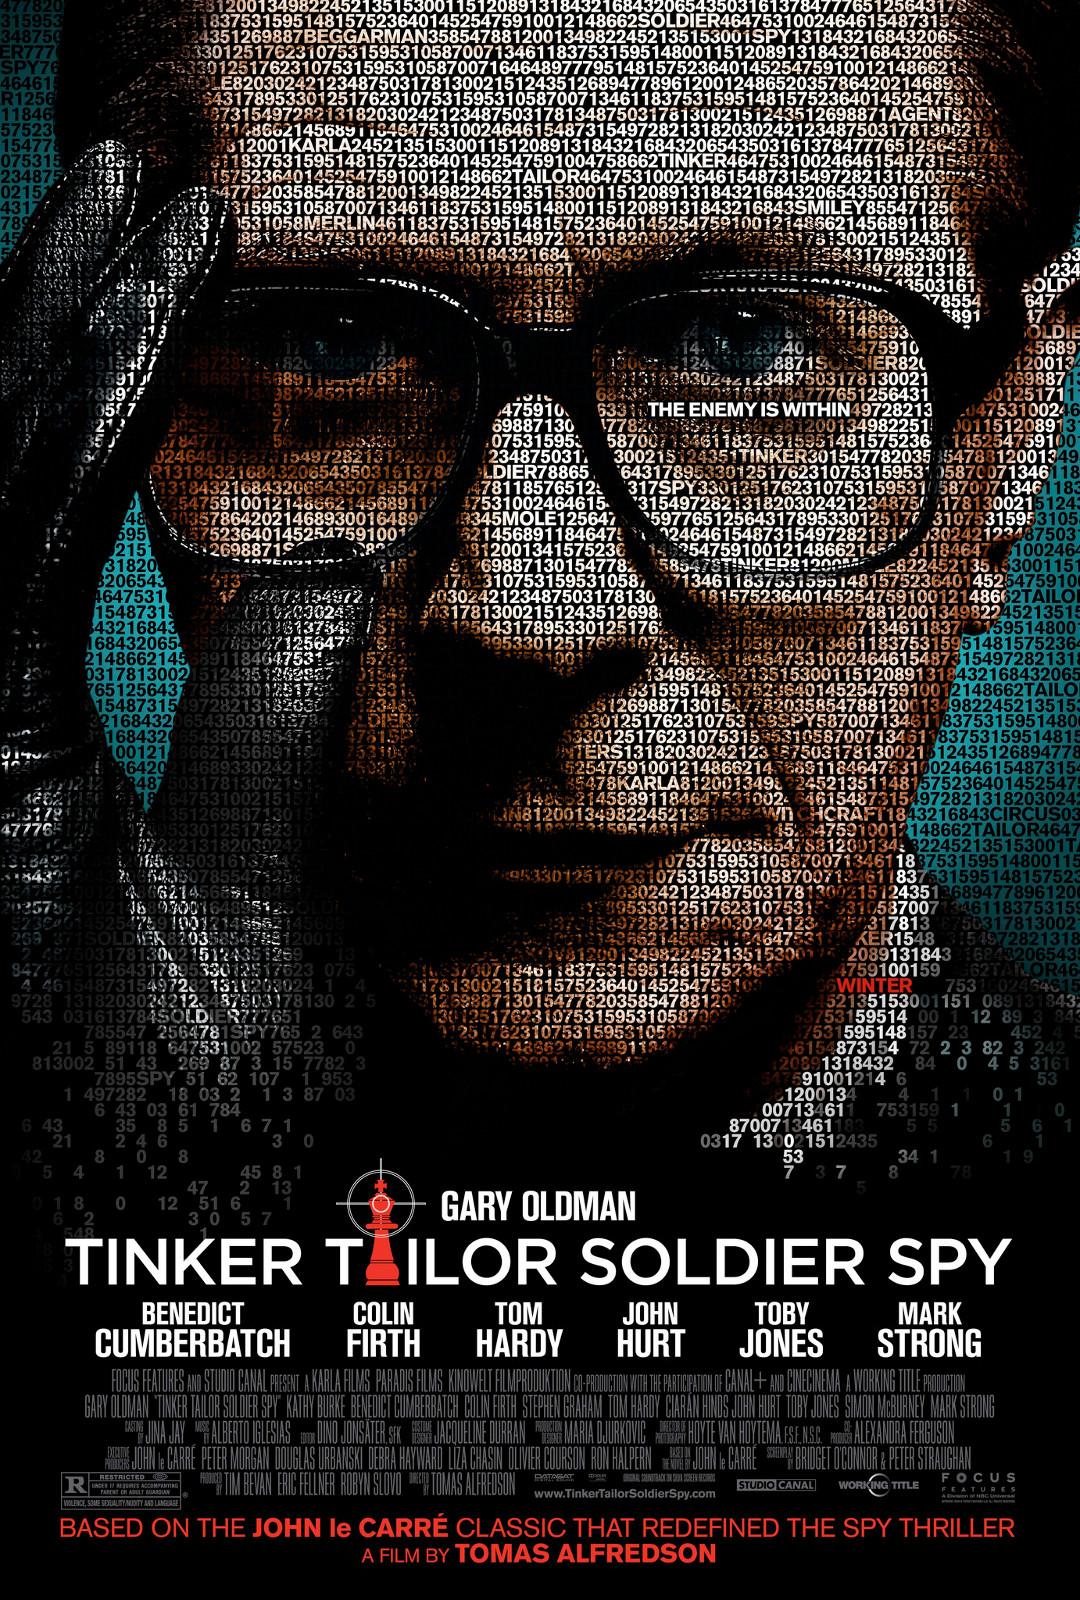 http://1.bp.blogspot.com/-u-eXs9U2_ms/TzjlpktpWEI/AAAAAAAACeo/unkaBA6_zE0/s1600/la-taupe-tinker-tailor-soldier-spy-poster-7.jpg